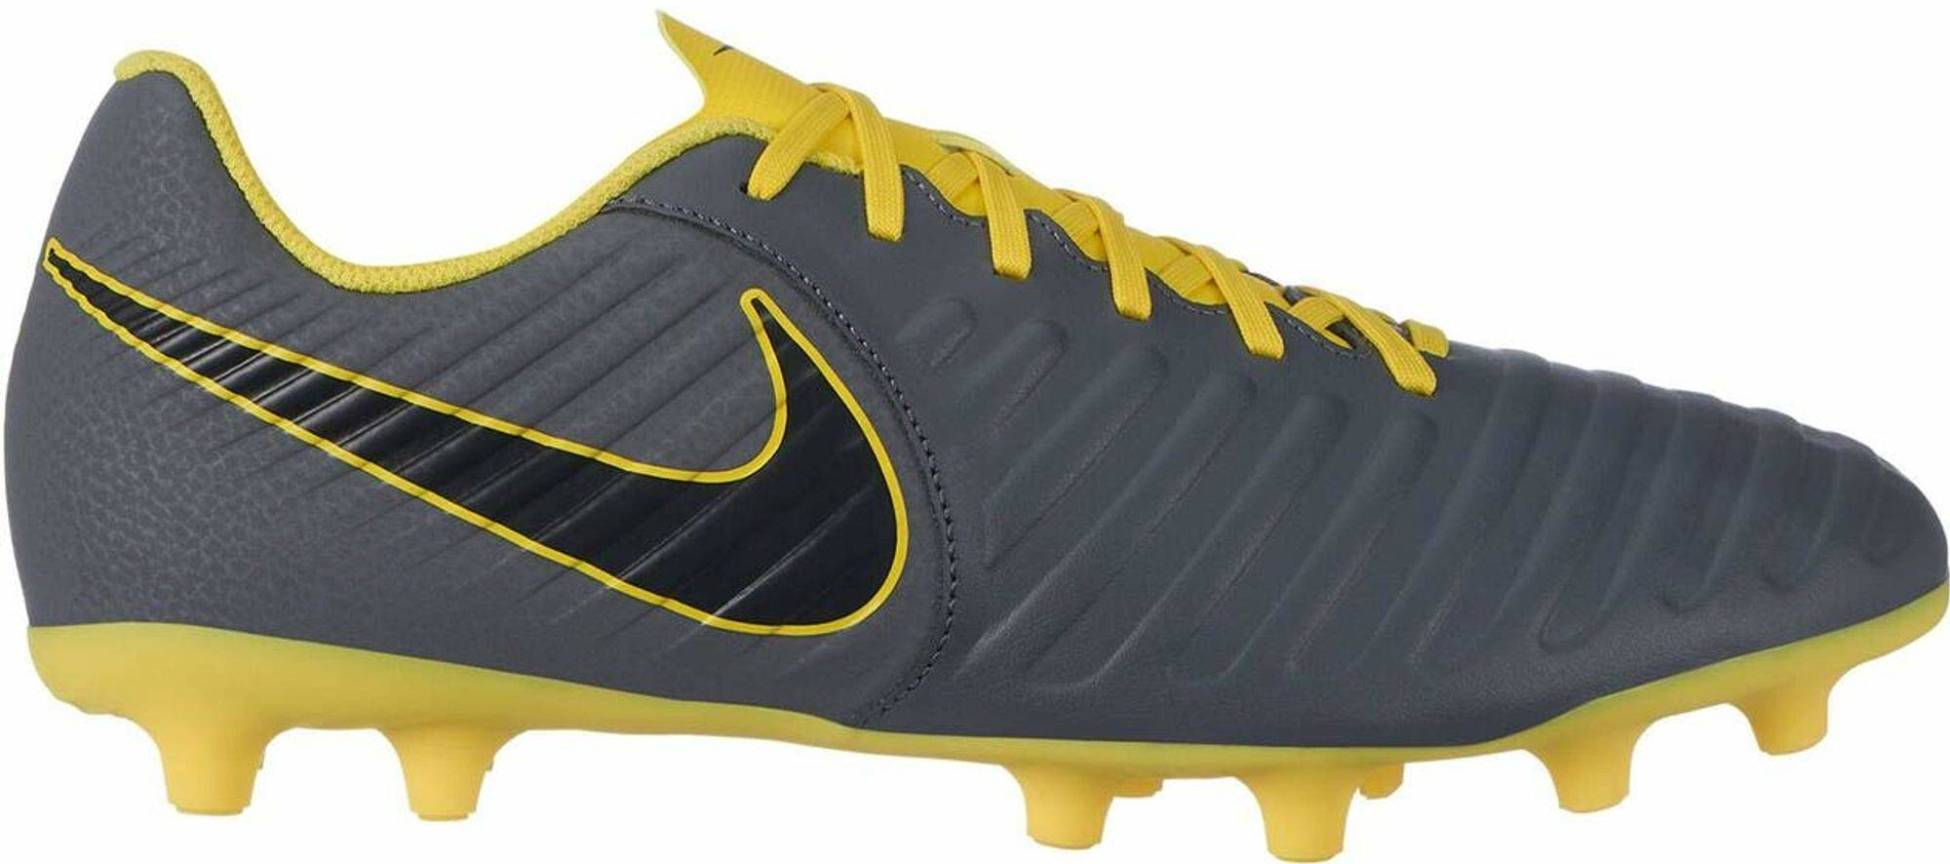 Confuso Pasto mil  Nike Tiempo Legend VII Club Multi-Ground Review (Jan 2021) | RunRepeat